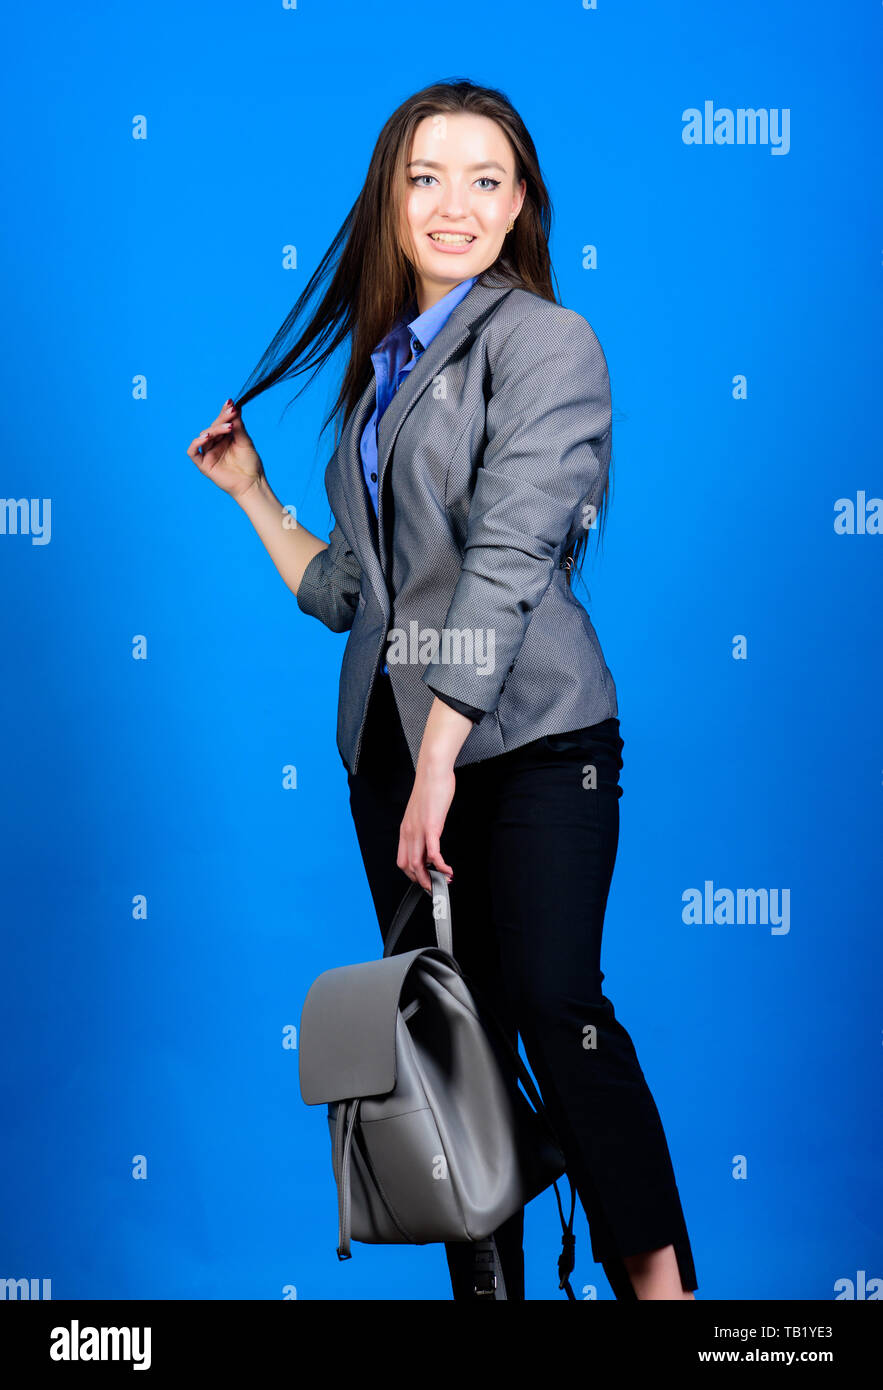 41f2966cd1eb85 Mochila para diario de la vida urbana moderna. Mujer con mochila de cuero.  Chica